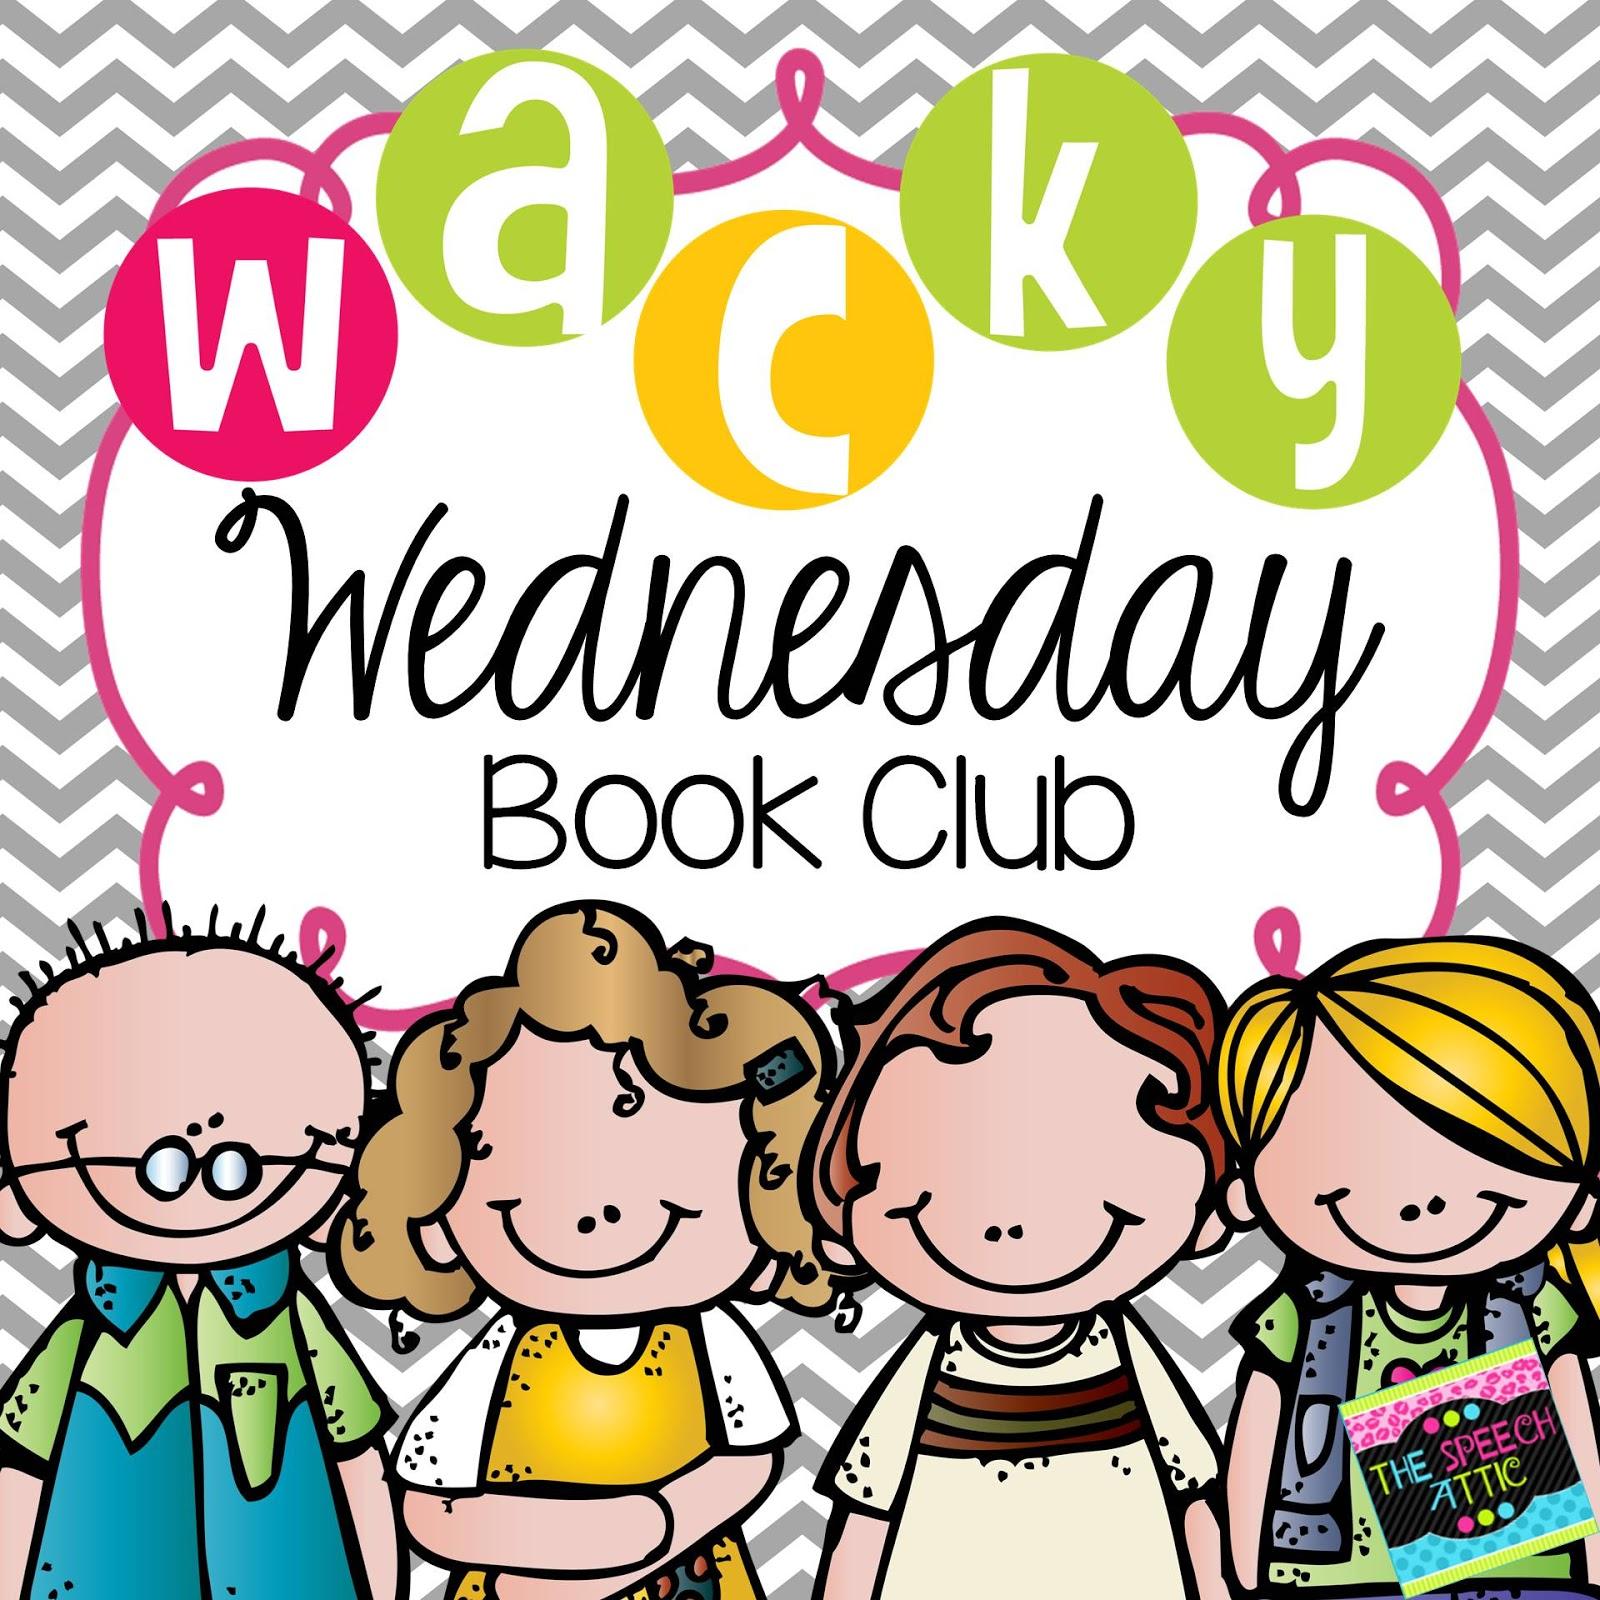 The Speech Attic Wacky Wednesday Book Club If You Take A